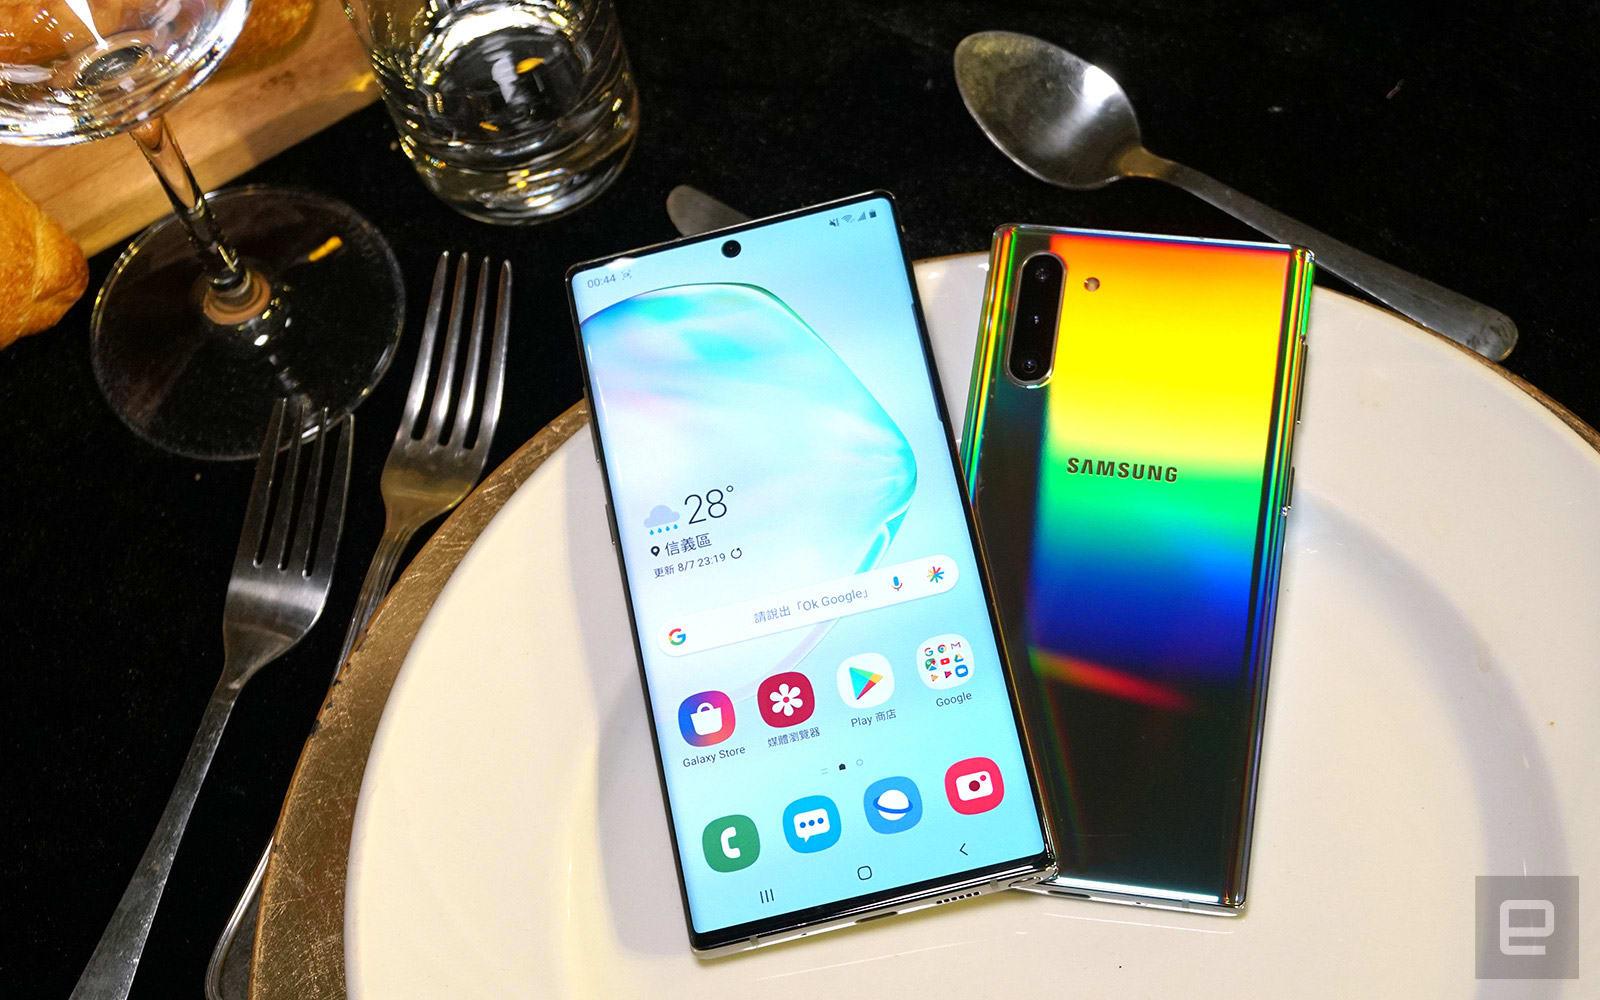 Samsung Galaxy Note 10 / Note 10+